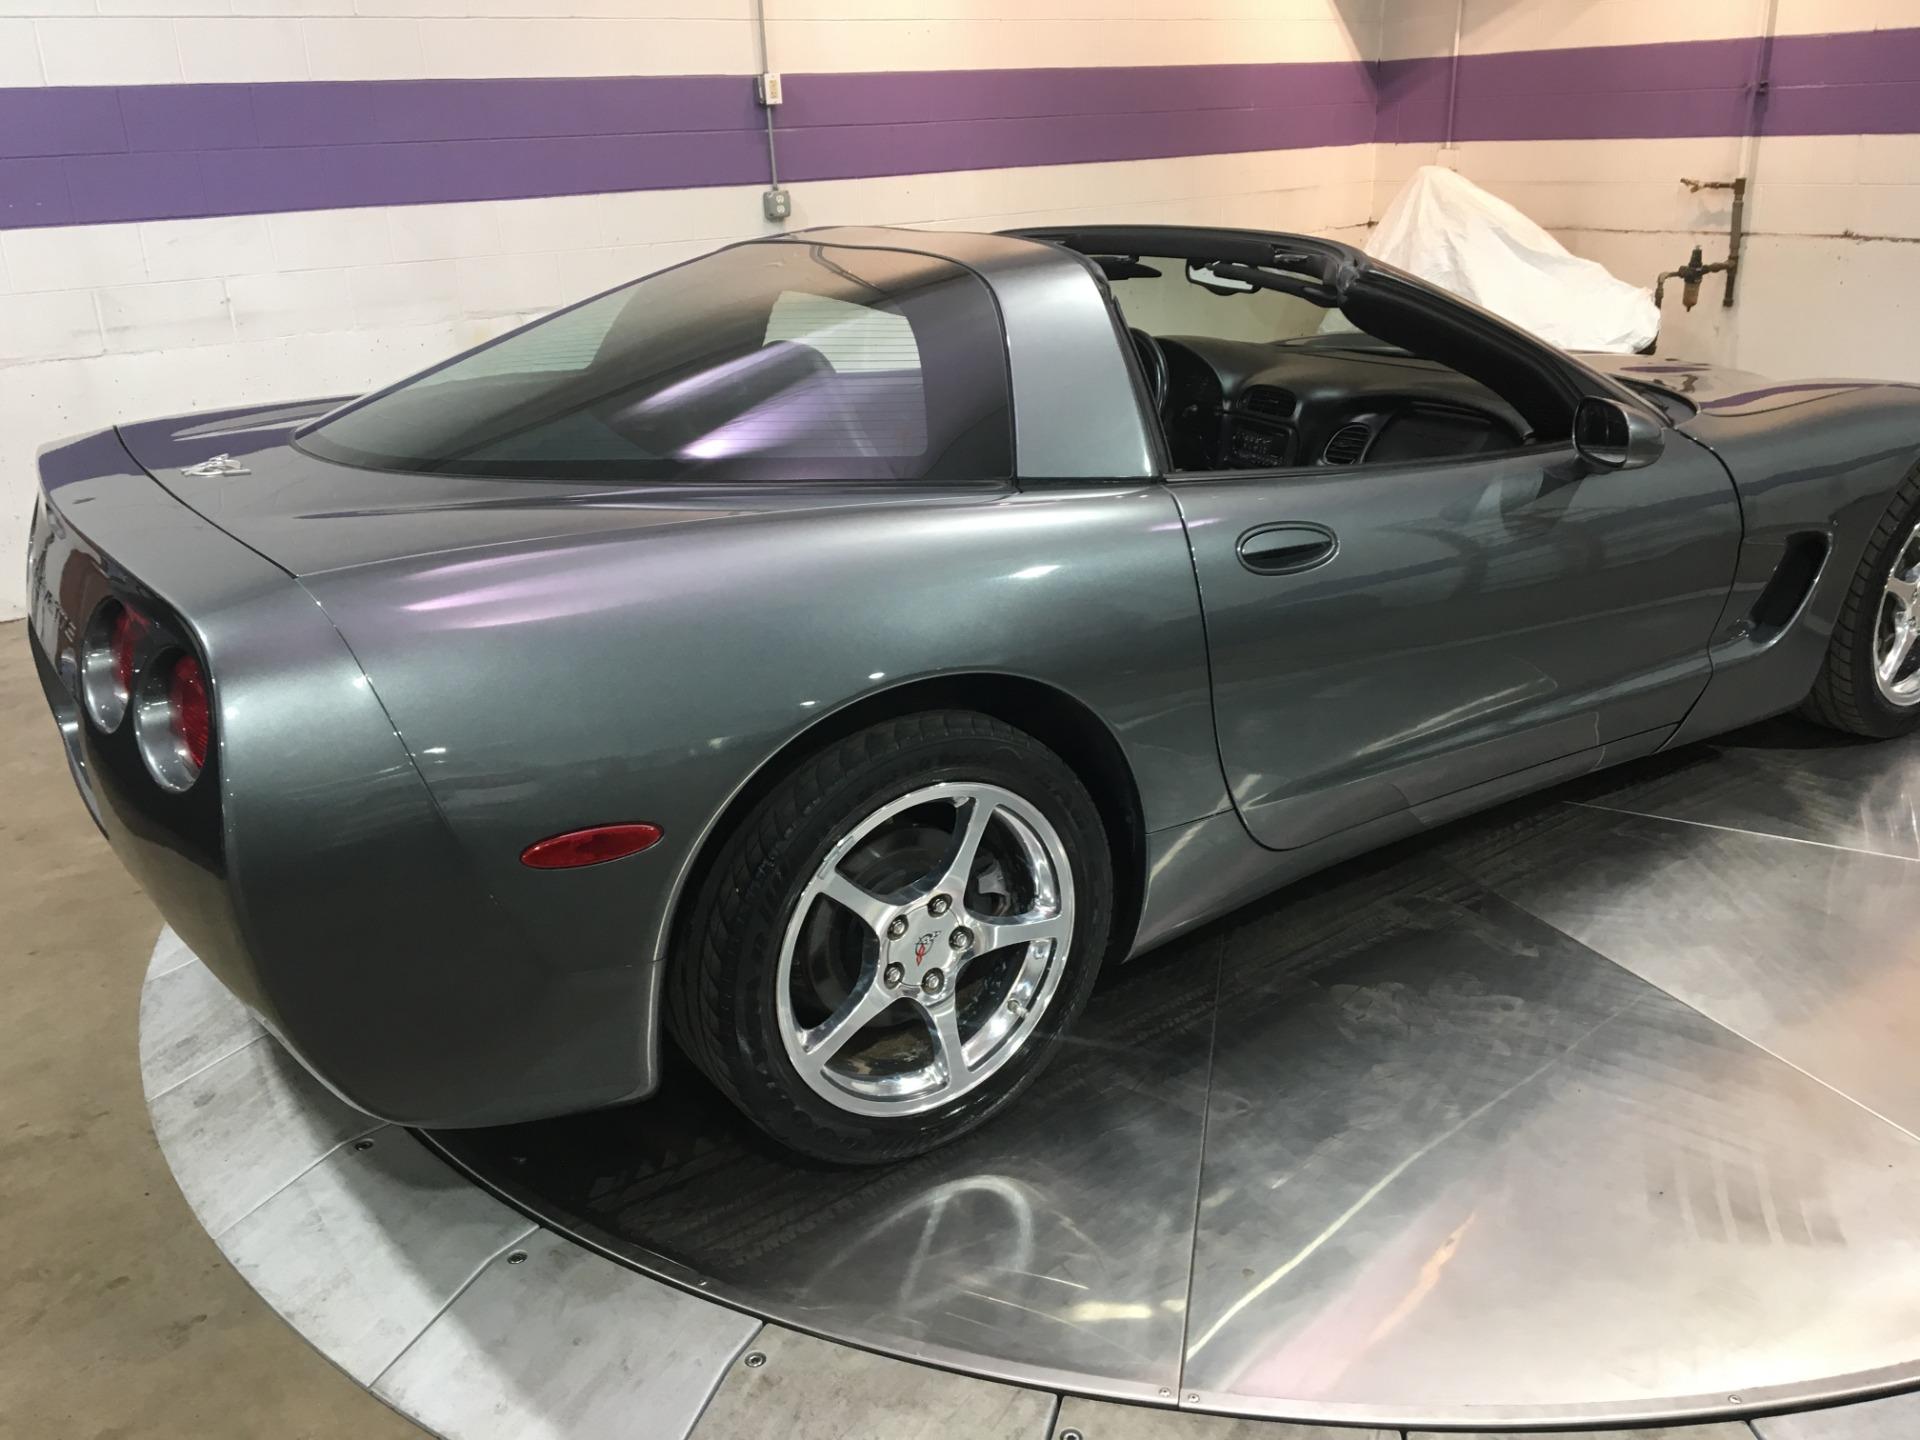 Corvette For Sale Near Me >> 2003 Chevrolet Corvette 50th Anniversary Manual Stock ...